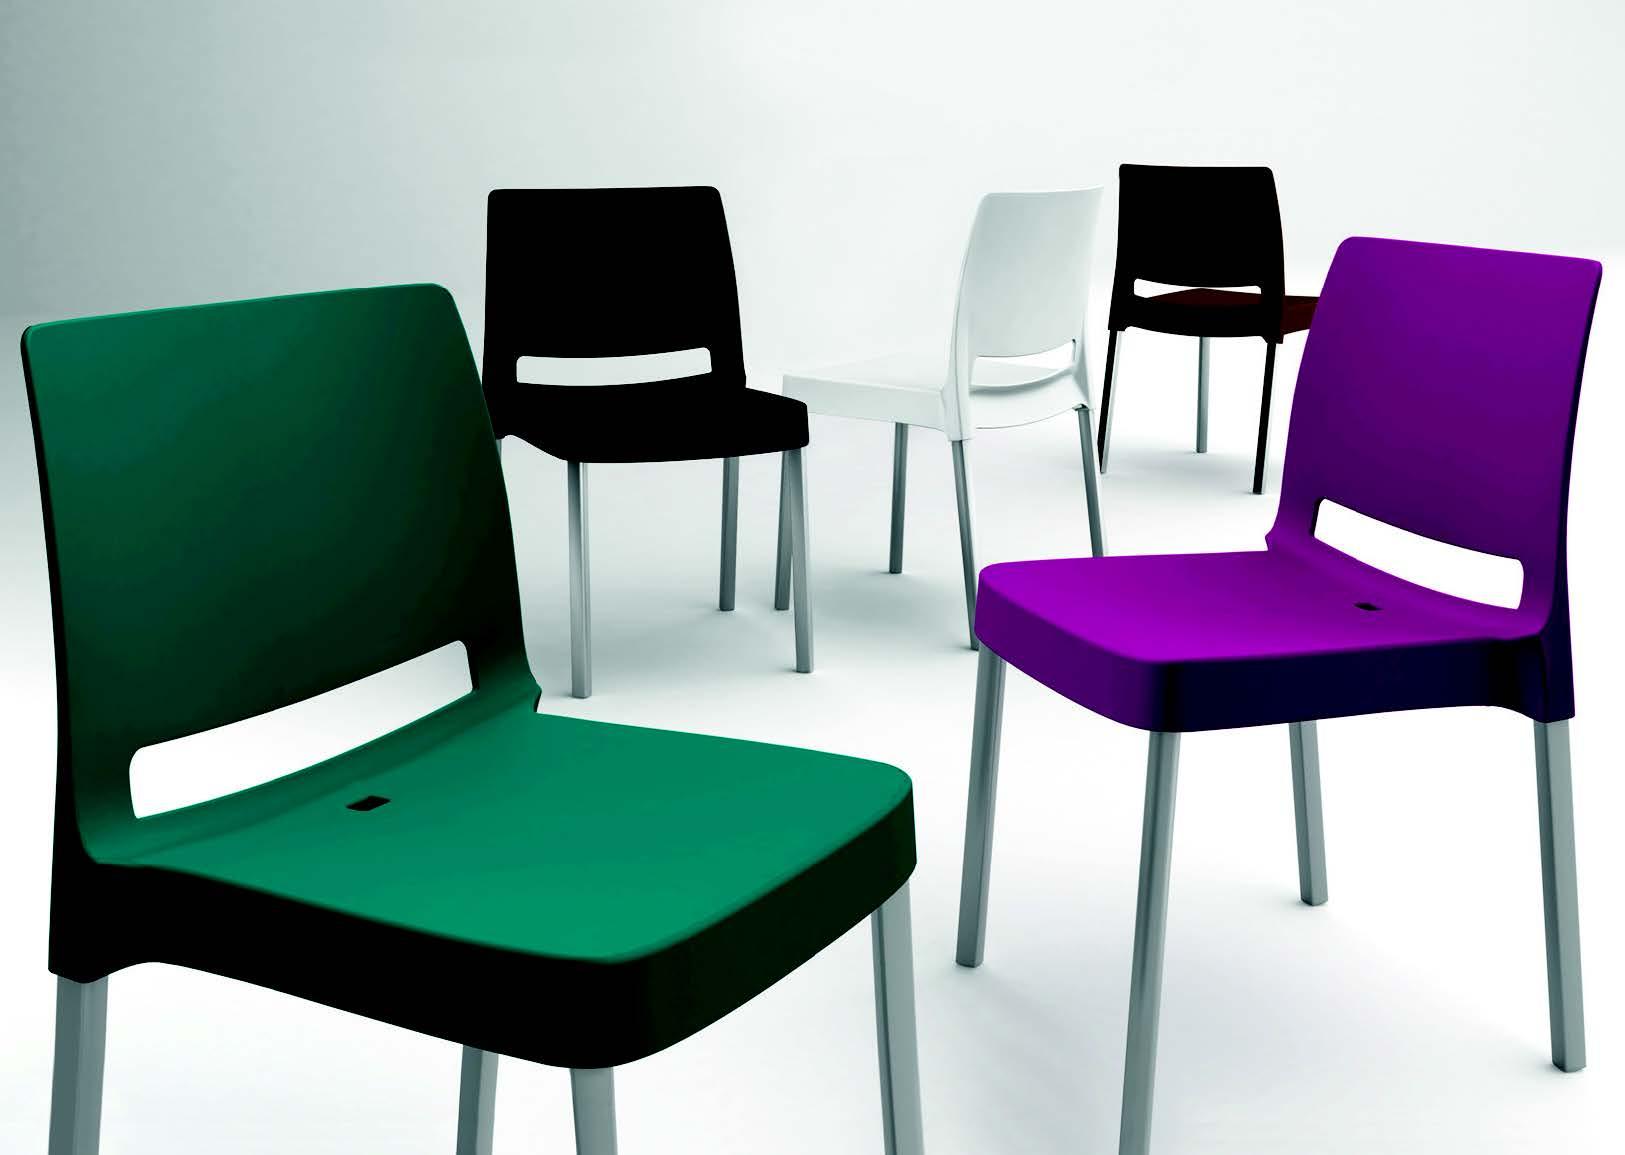 Sedia impilabile joi galimberti sedie e tavoli